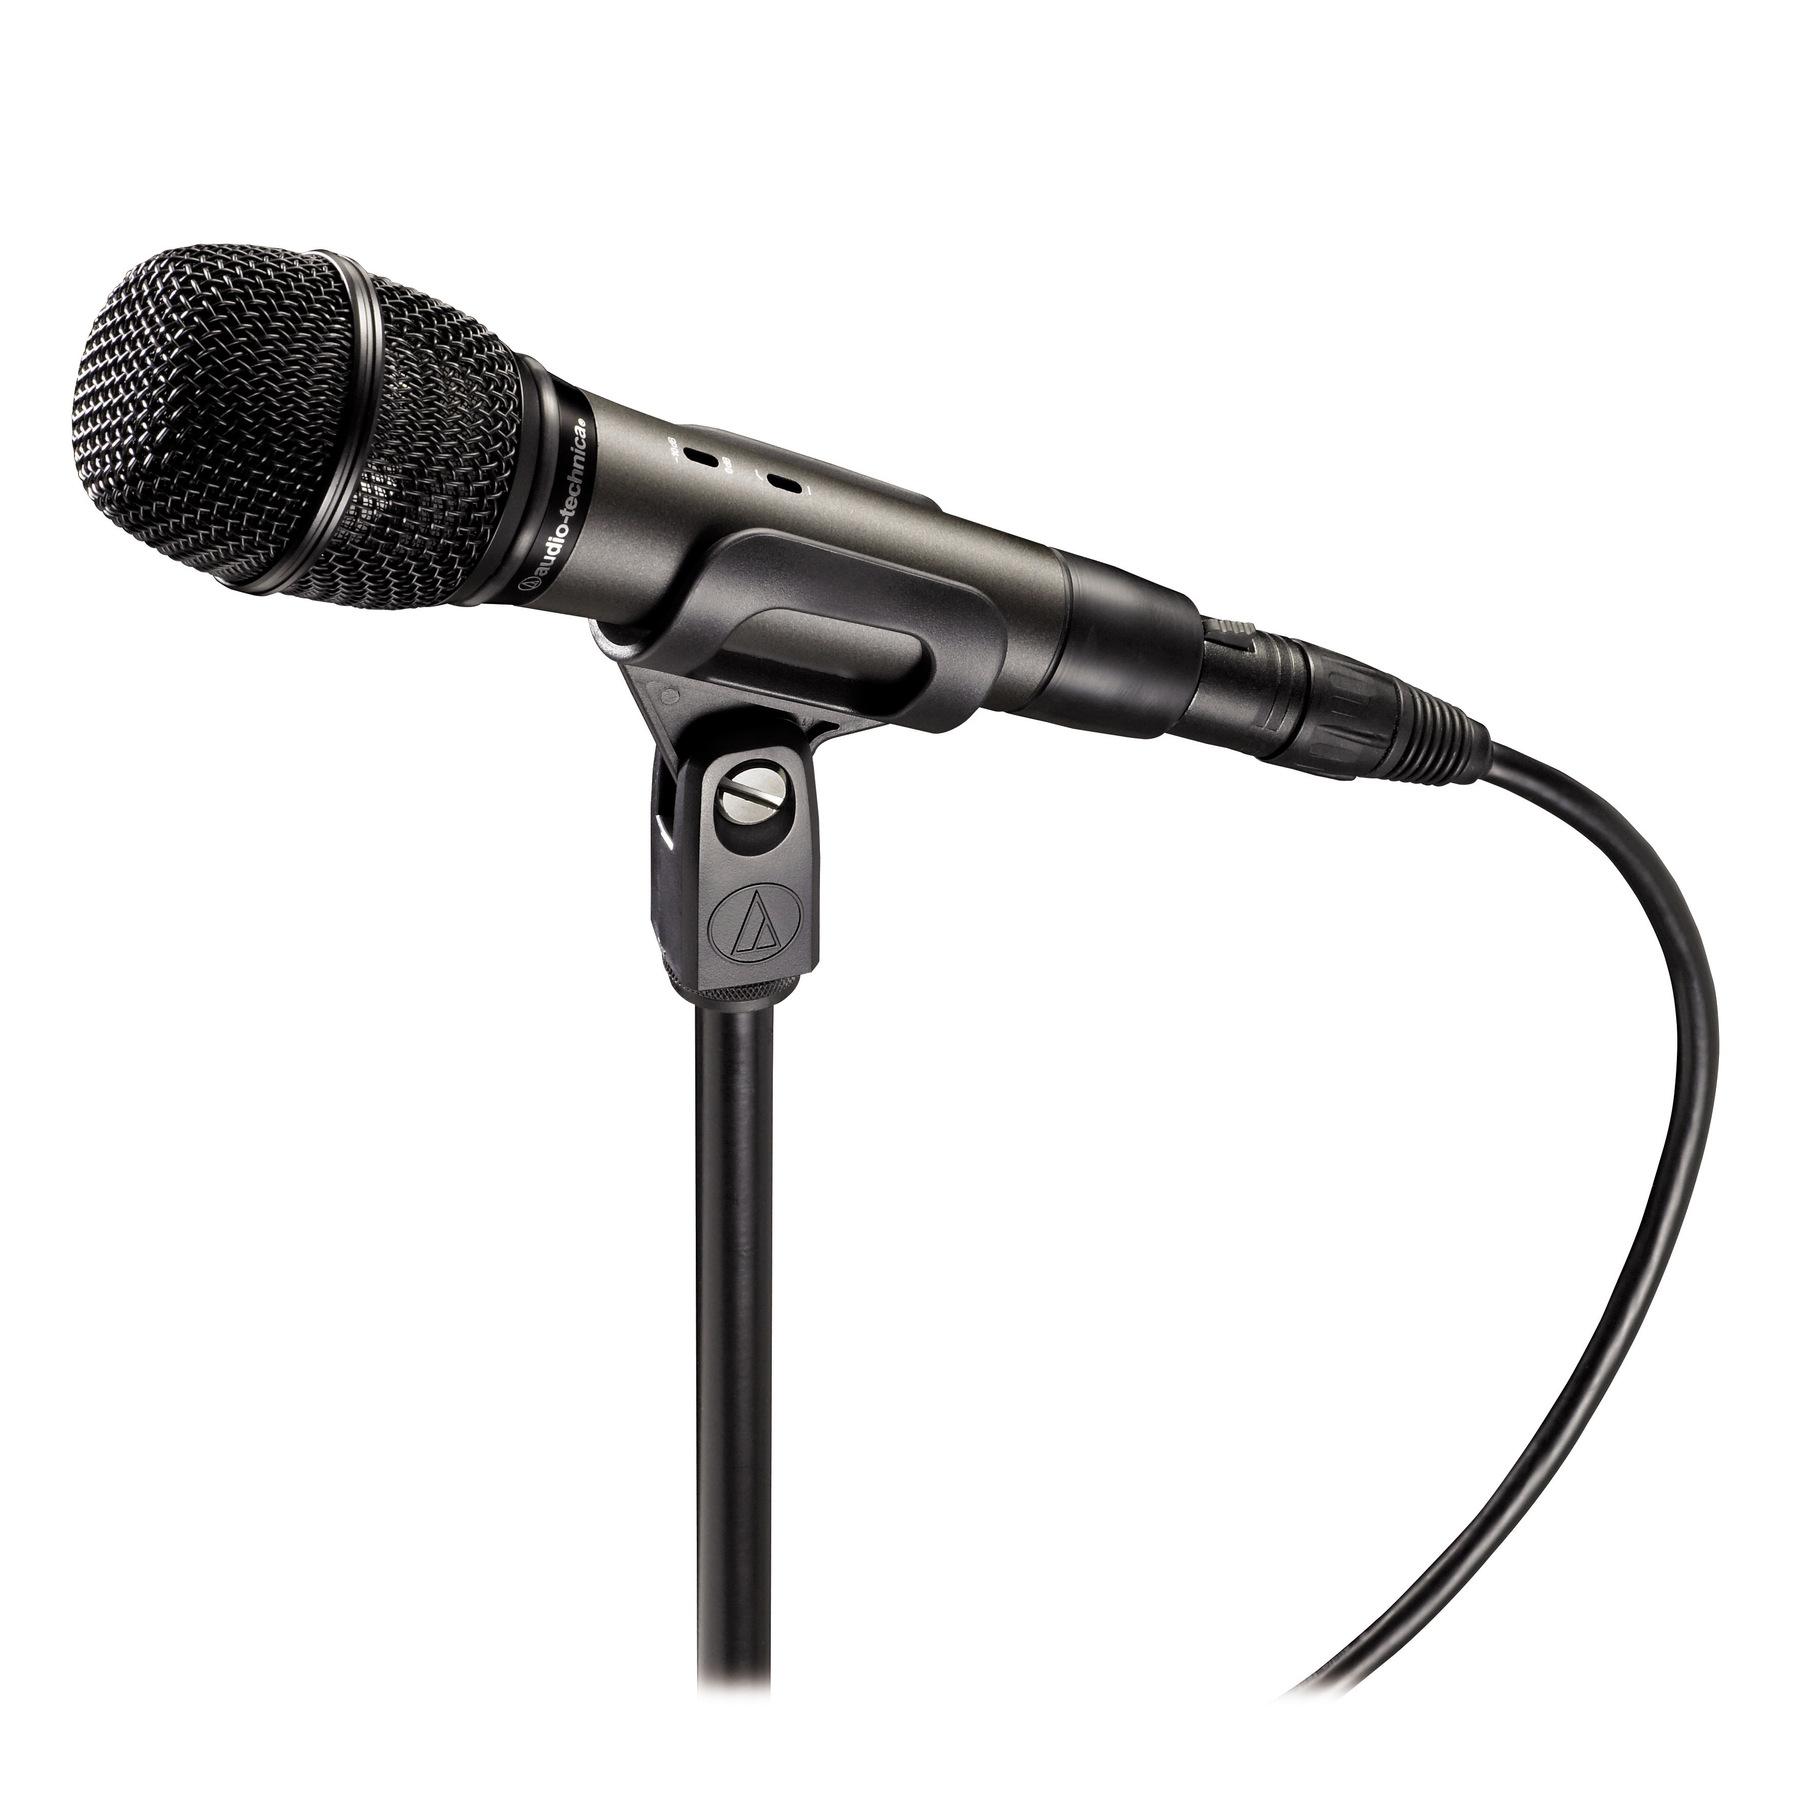 Картинки микрофона на стойке